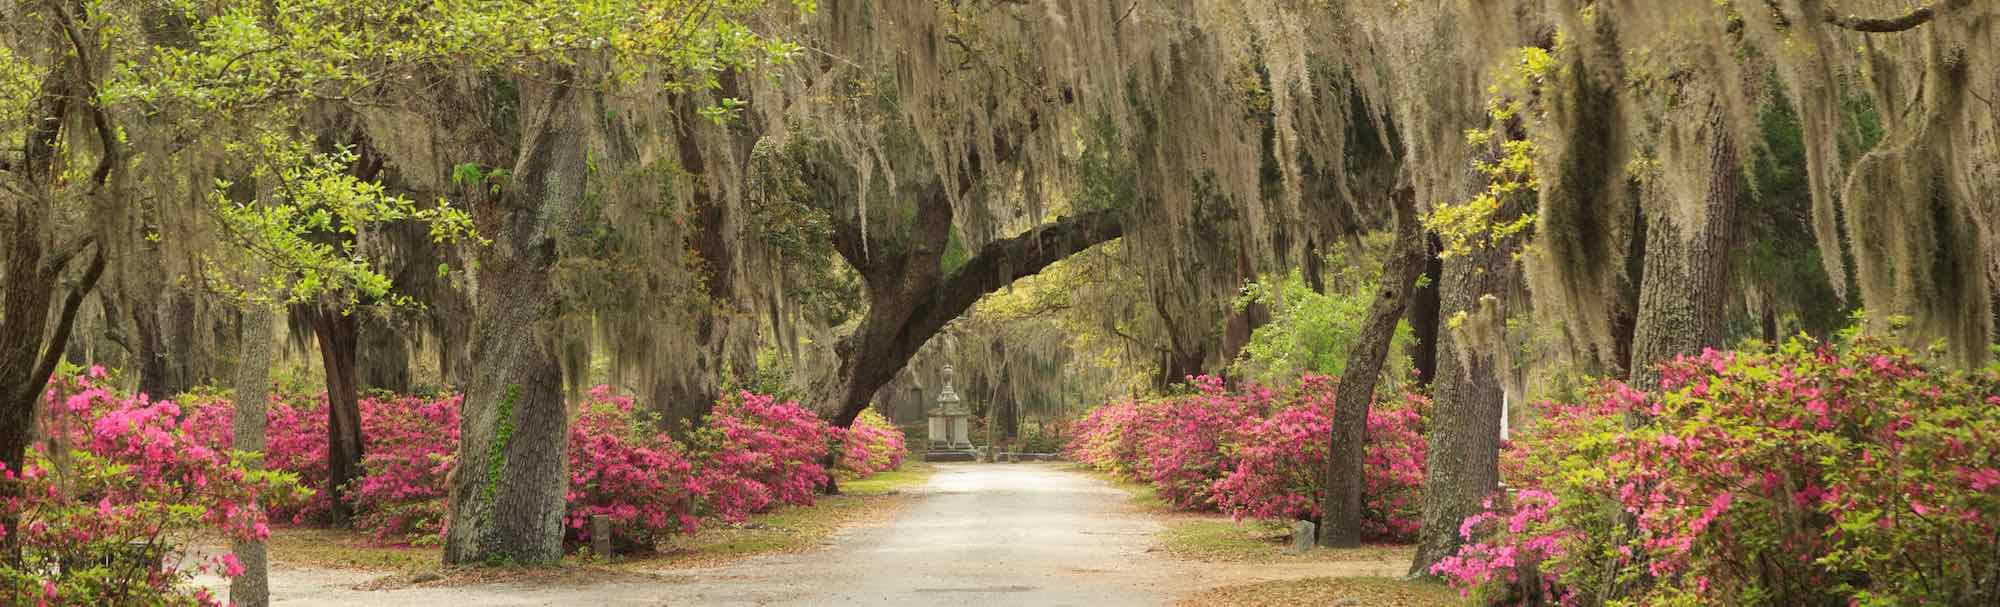 An azalea-and-oak-lined avenue in Bonaventure Cemetery, Savannah, GA.